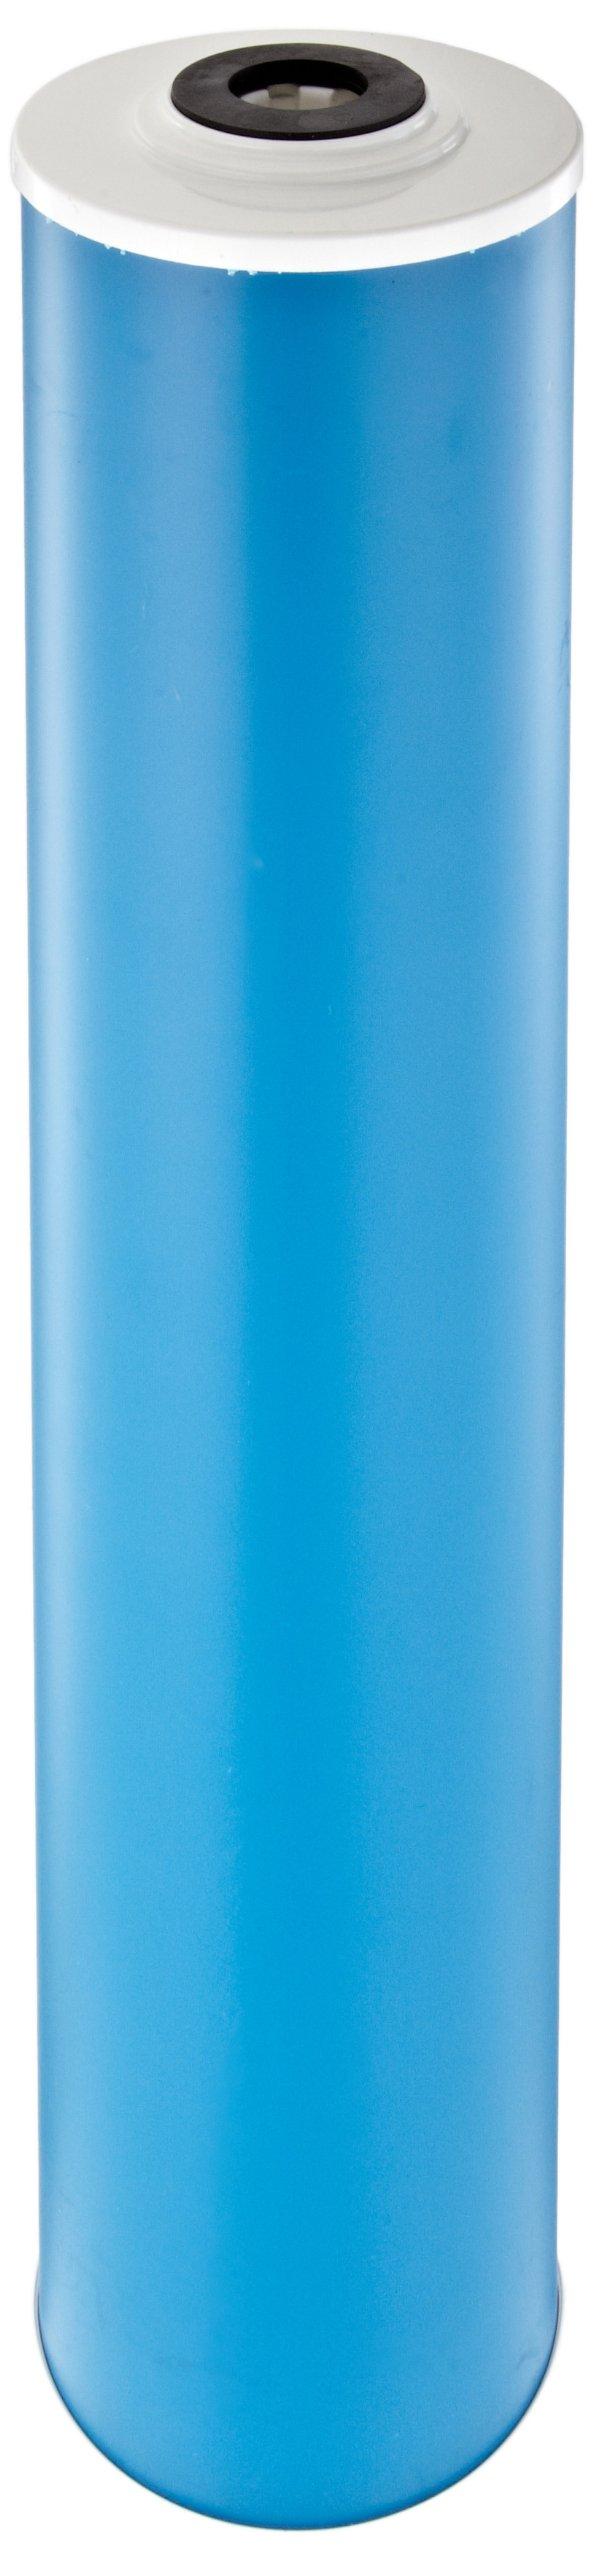 Pentek GAC-20BB Carbon Filter Cartridge, 20'' x 4-1/2''